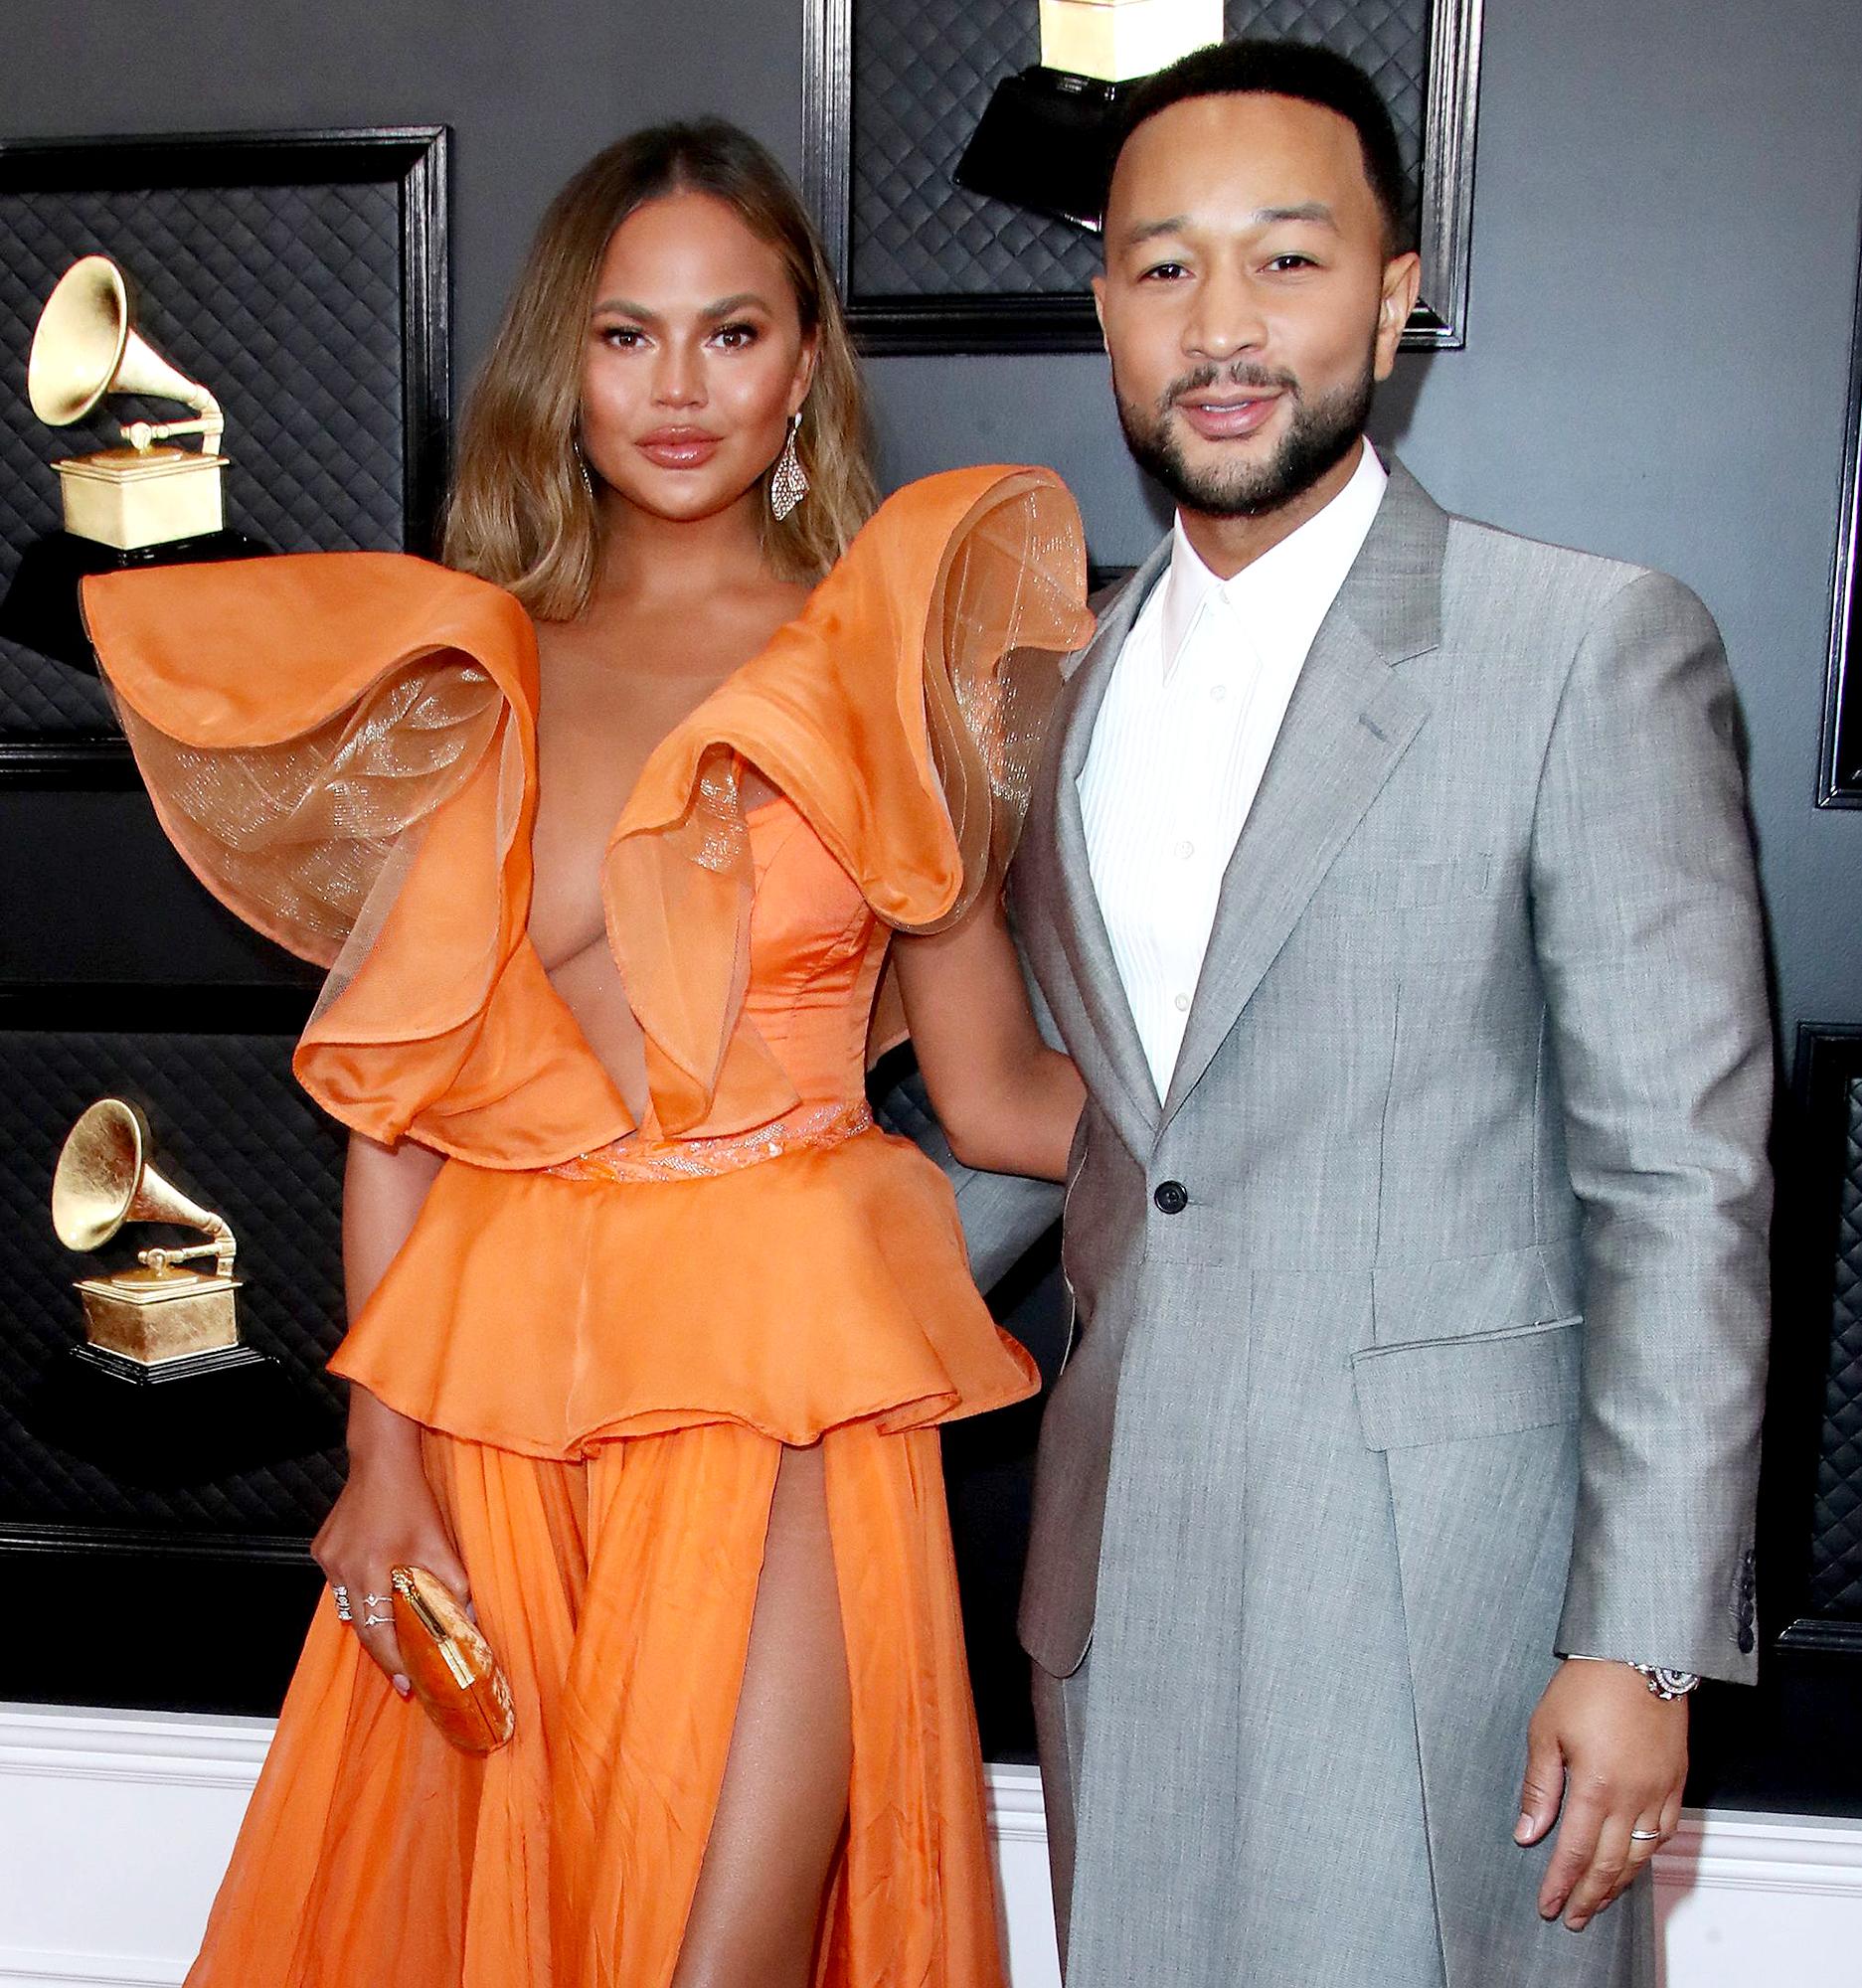 Celebs Support Chrissy Teigen, John Legend After Pregnancy Loss